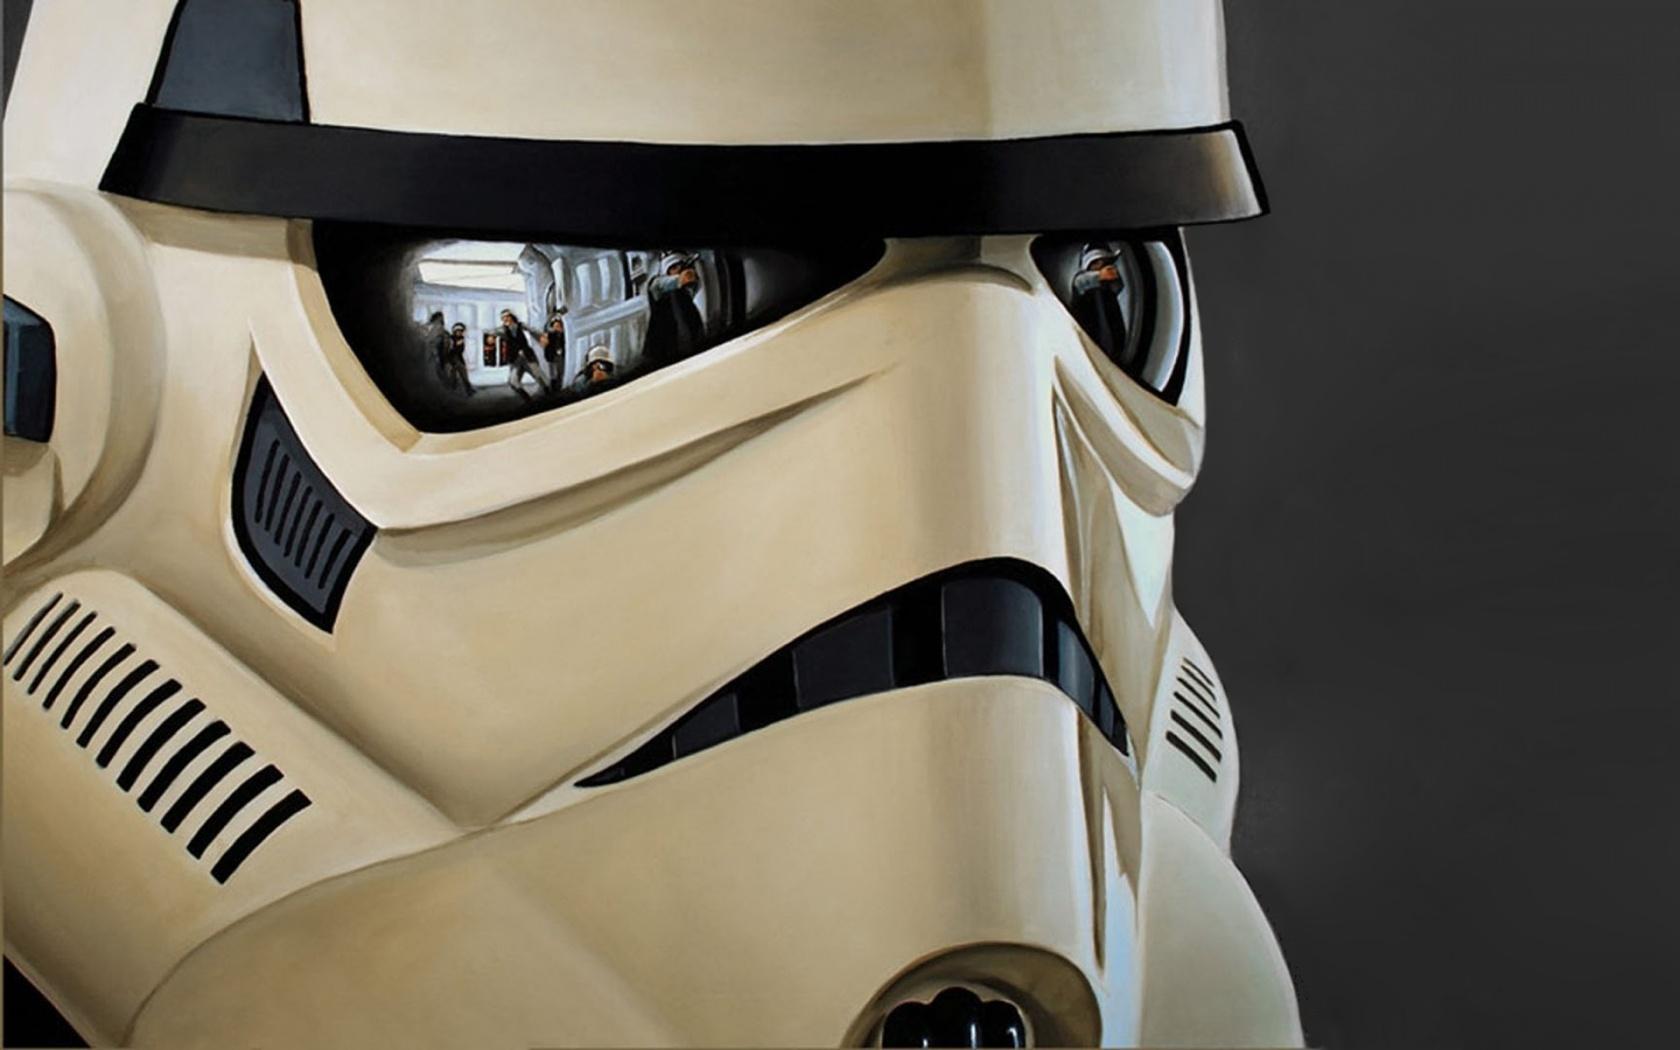 1680x1050 Stormtrooper desktop PC and Mac wallpaper 1680x1050